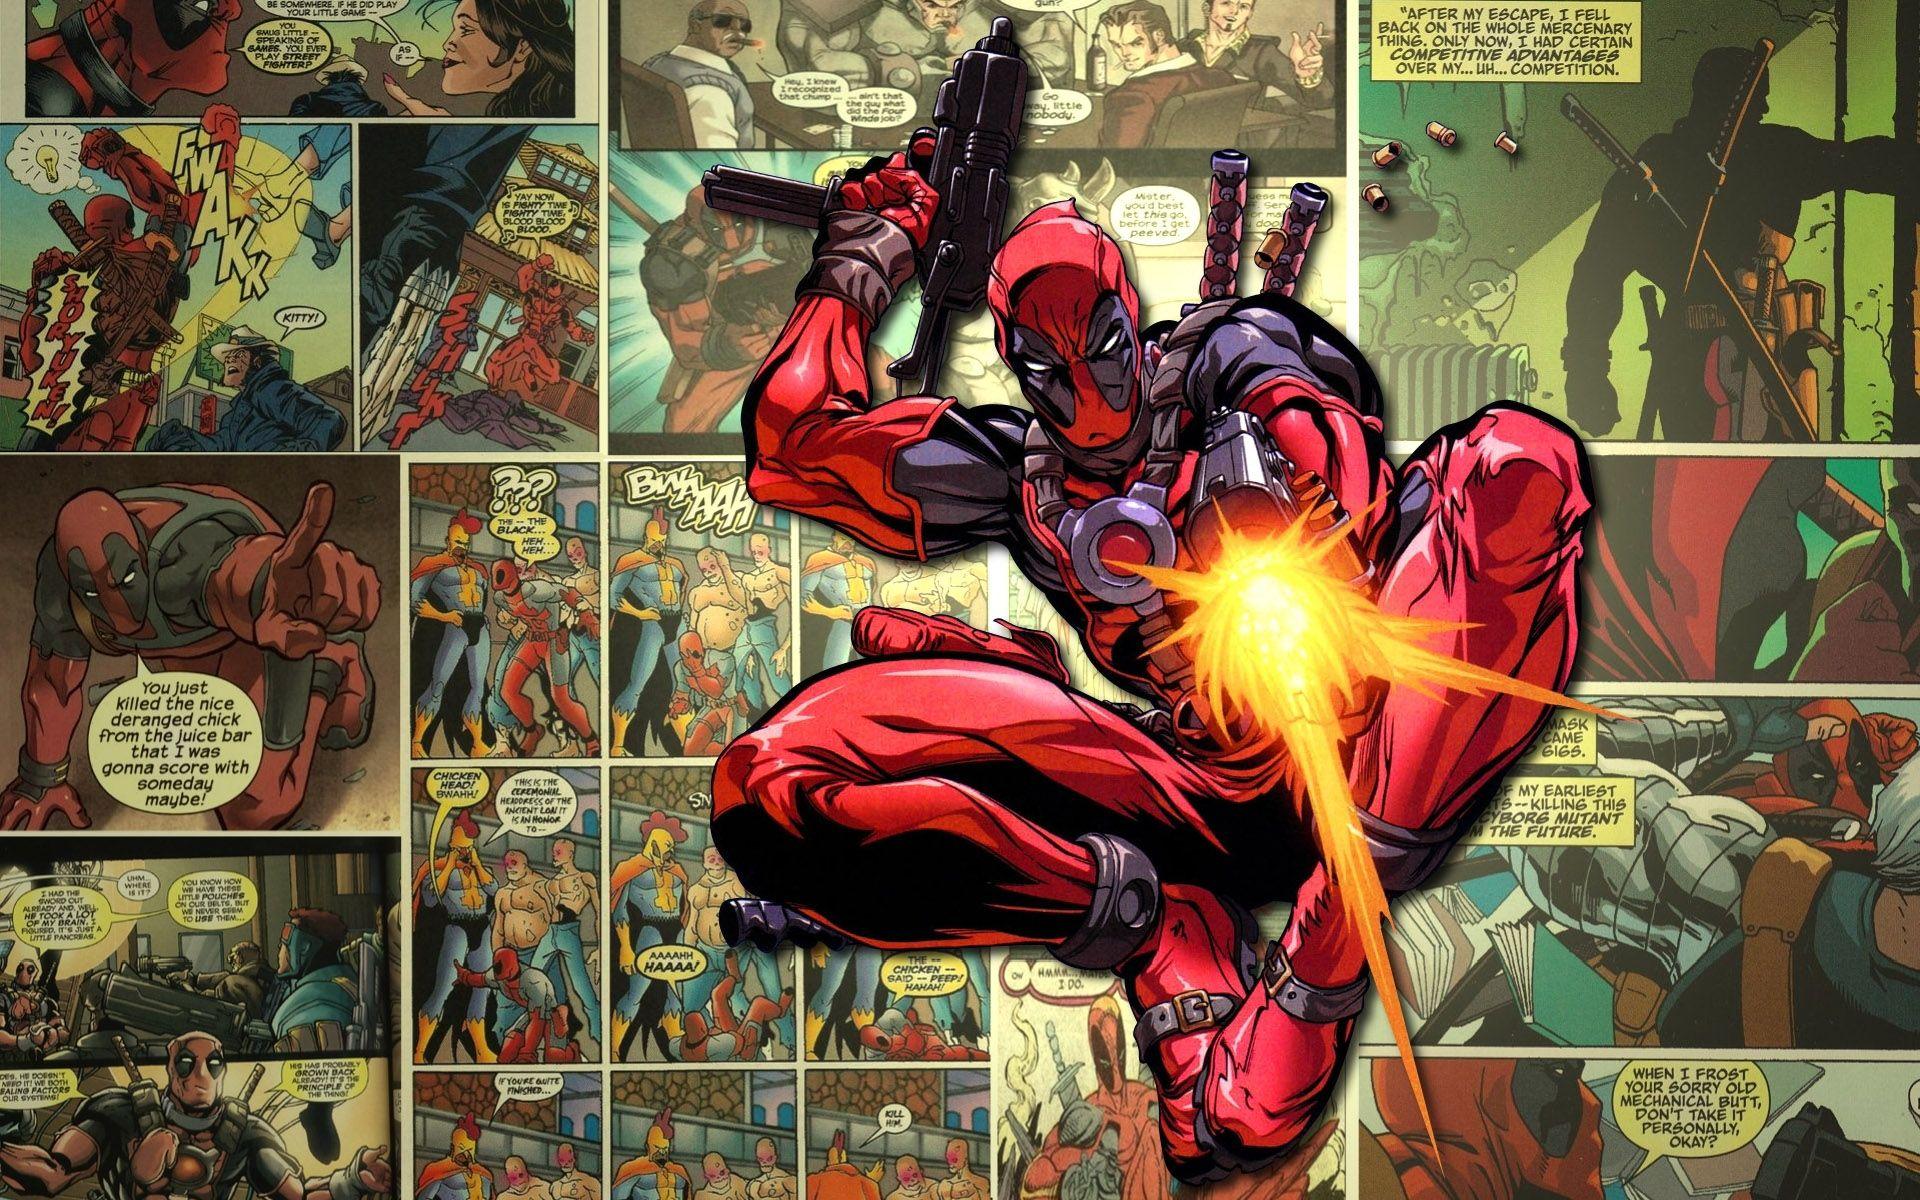 Top Wallpaper Mac Superhero - 7f49cdac956d705eedfe990d66a85a64  Gallery_651046.jpg